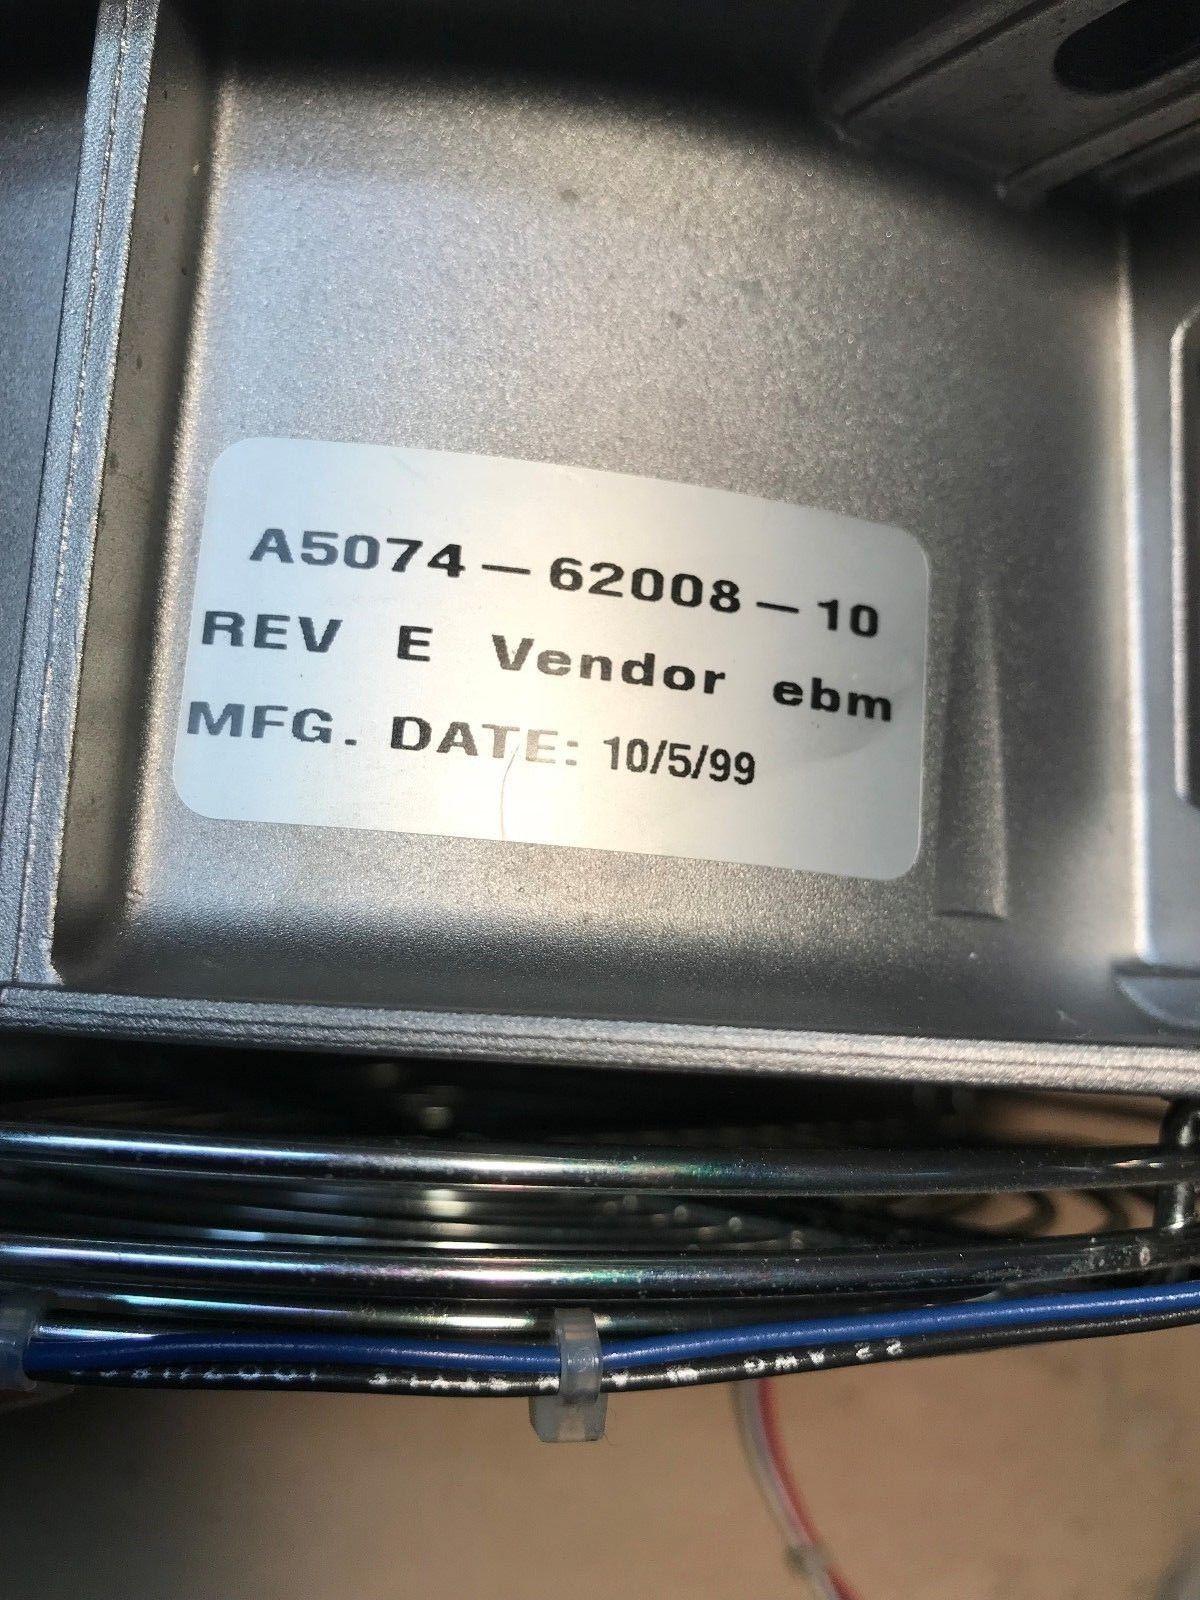 ebm W1G200-HH01-12 48V SX impedance proteced 45W fan